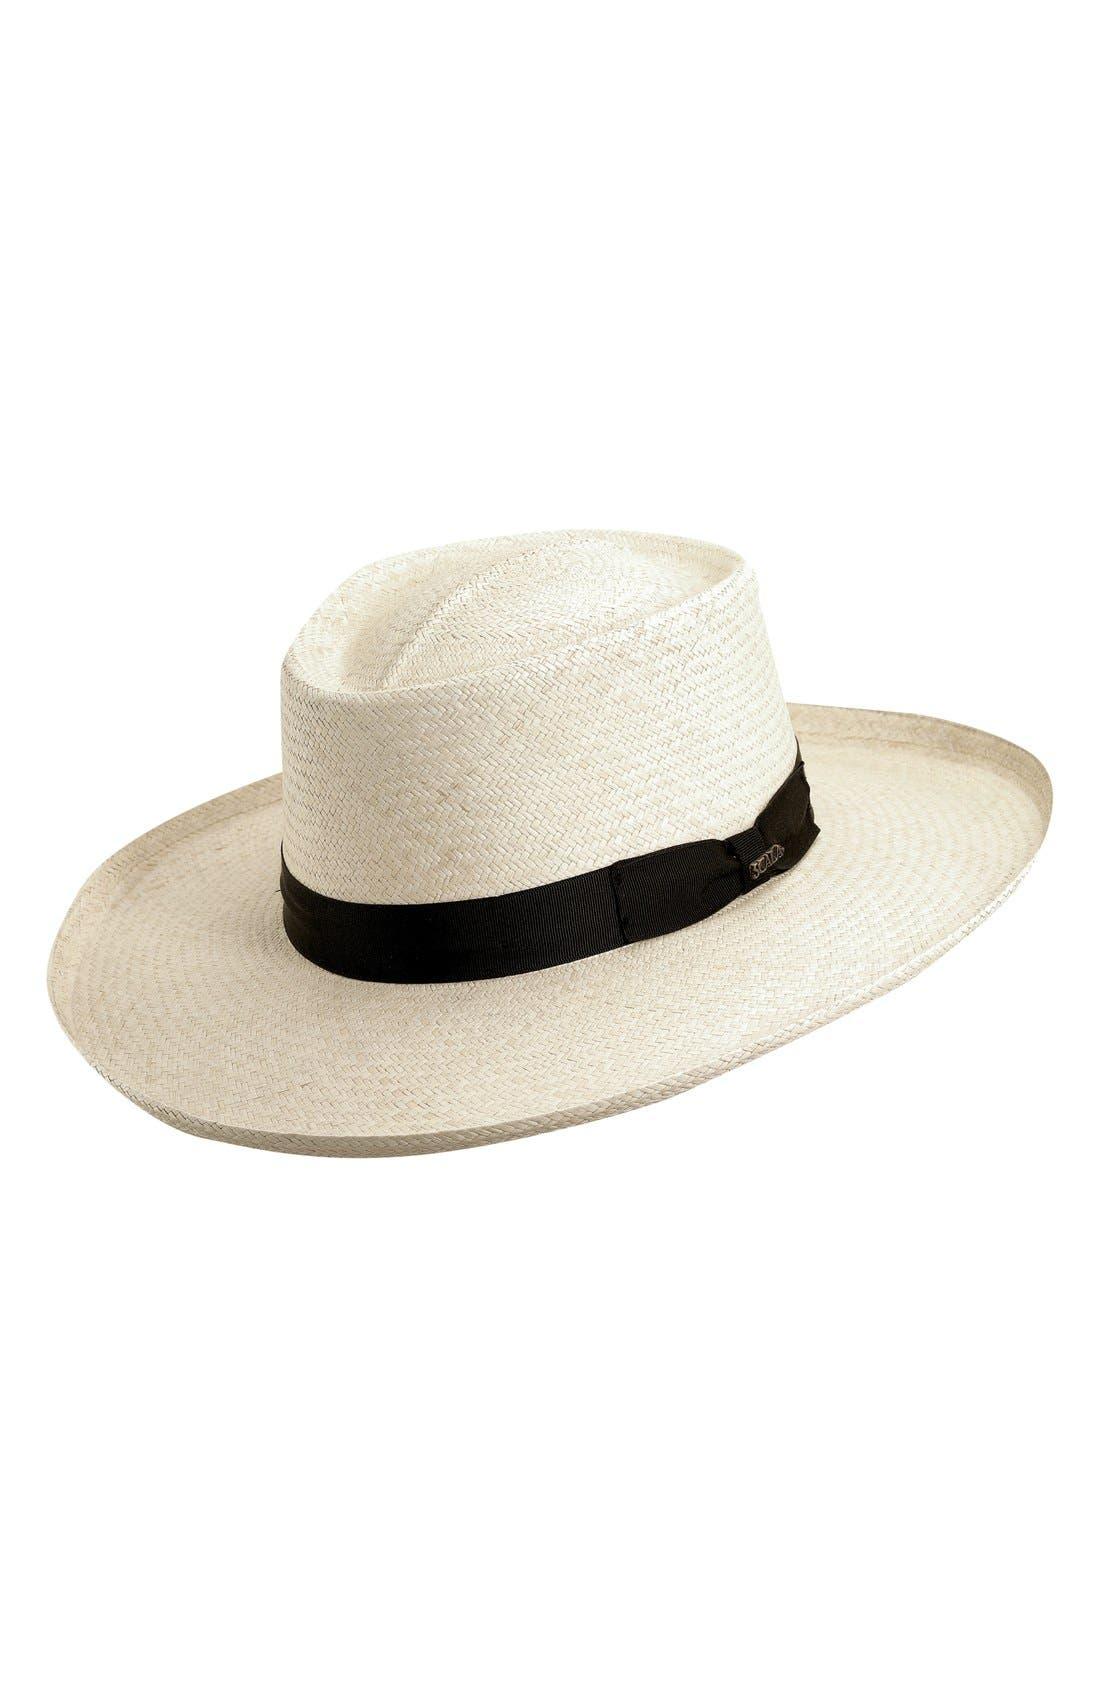 Victorian Men's Hats- Top Hats, Bowler, Gambler Mens Scala Straw Gambler Hat - White $130.00 AT vintagedancer.com